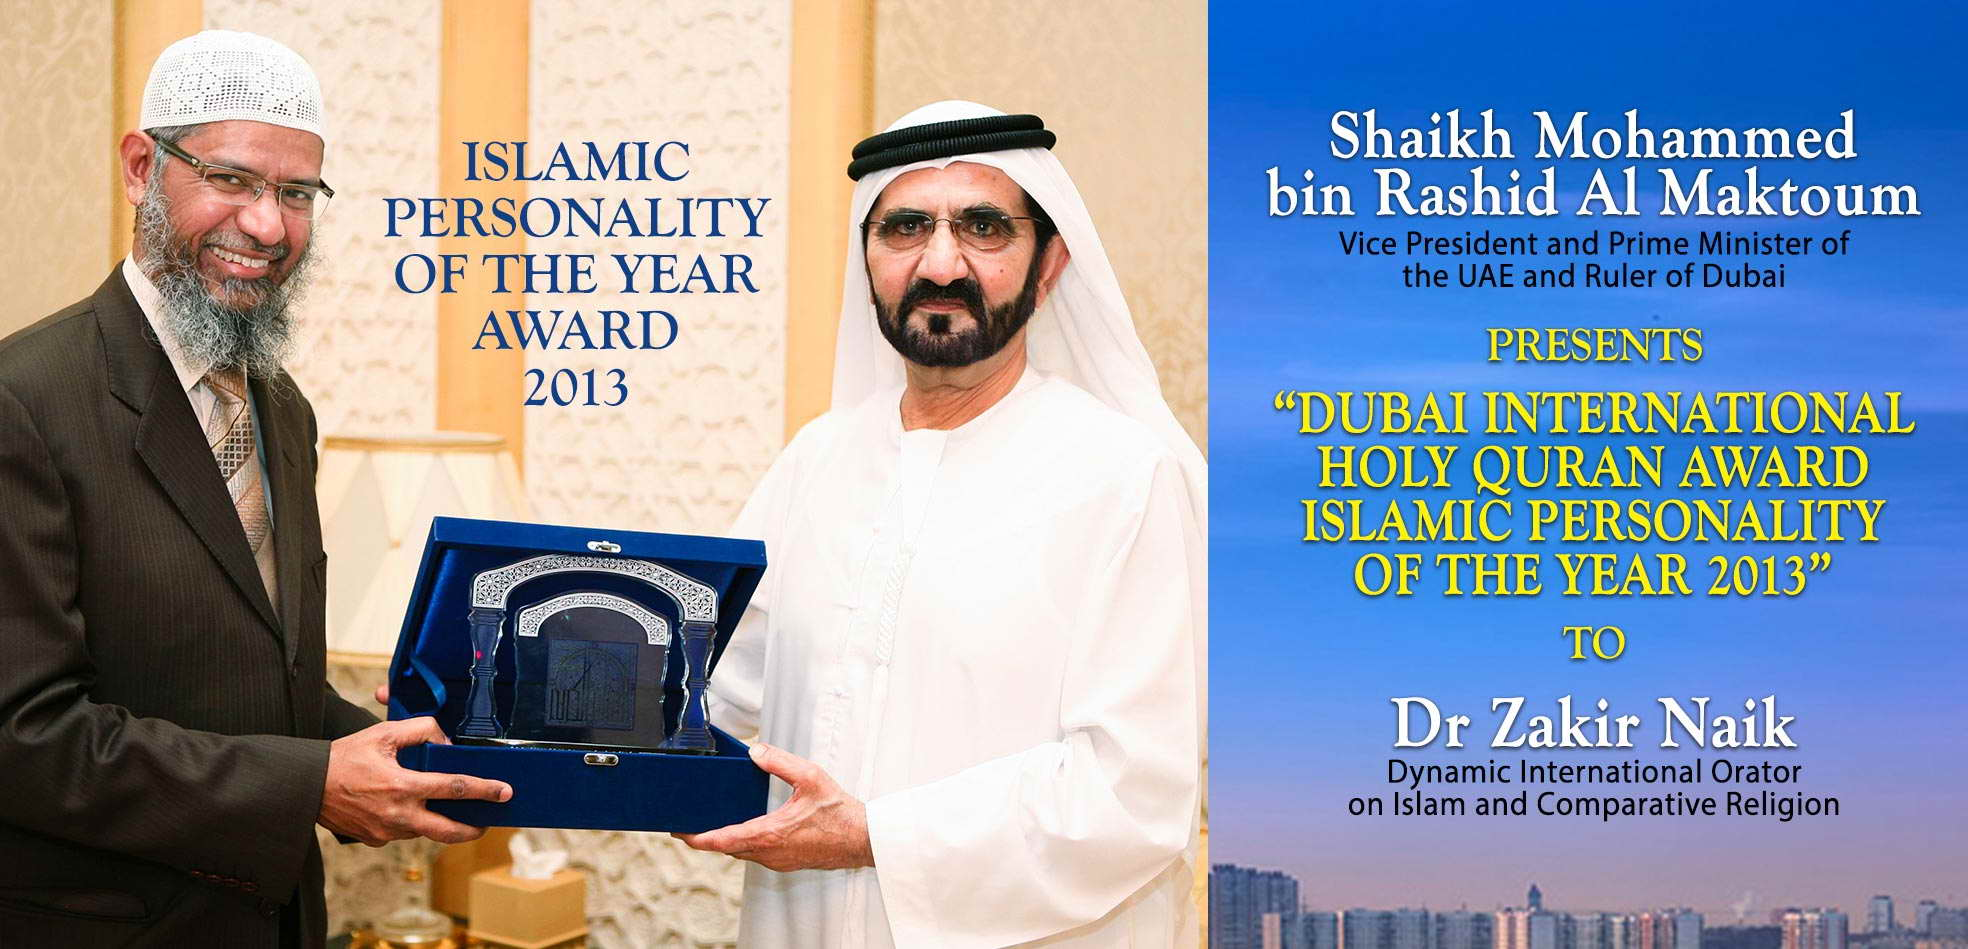 Dubai International Holy Quran Award for Islamic Personality of the Year - 2013